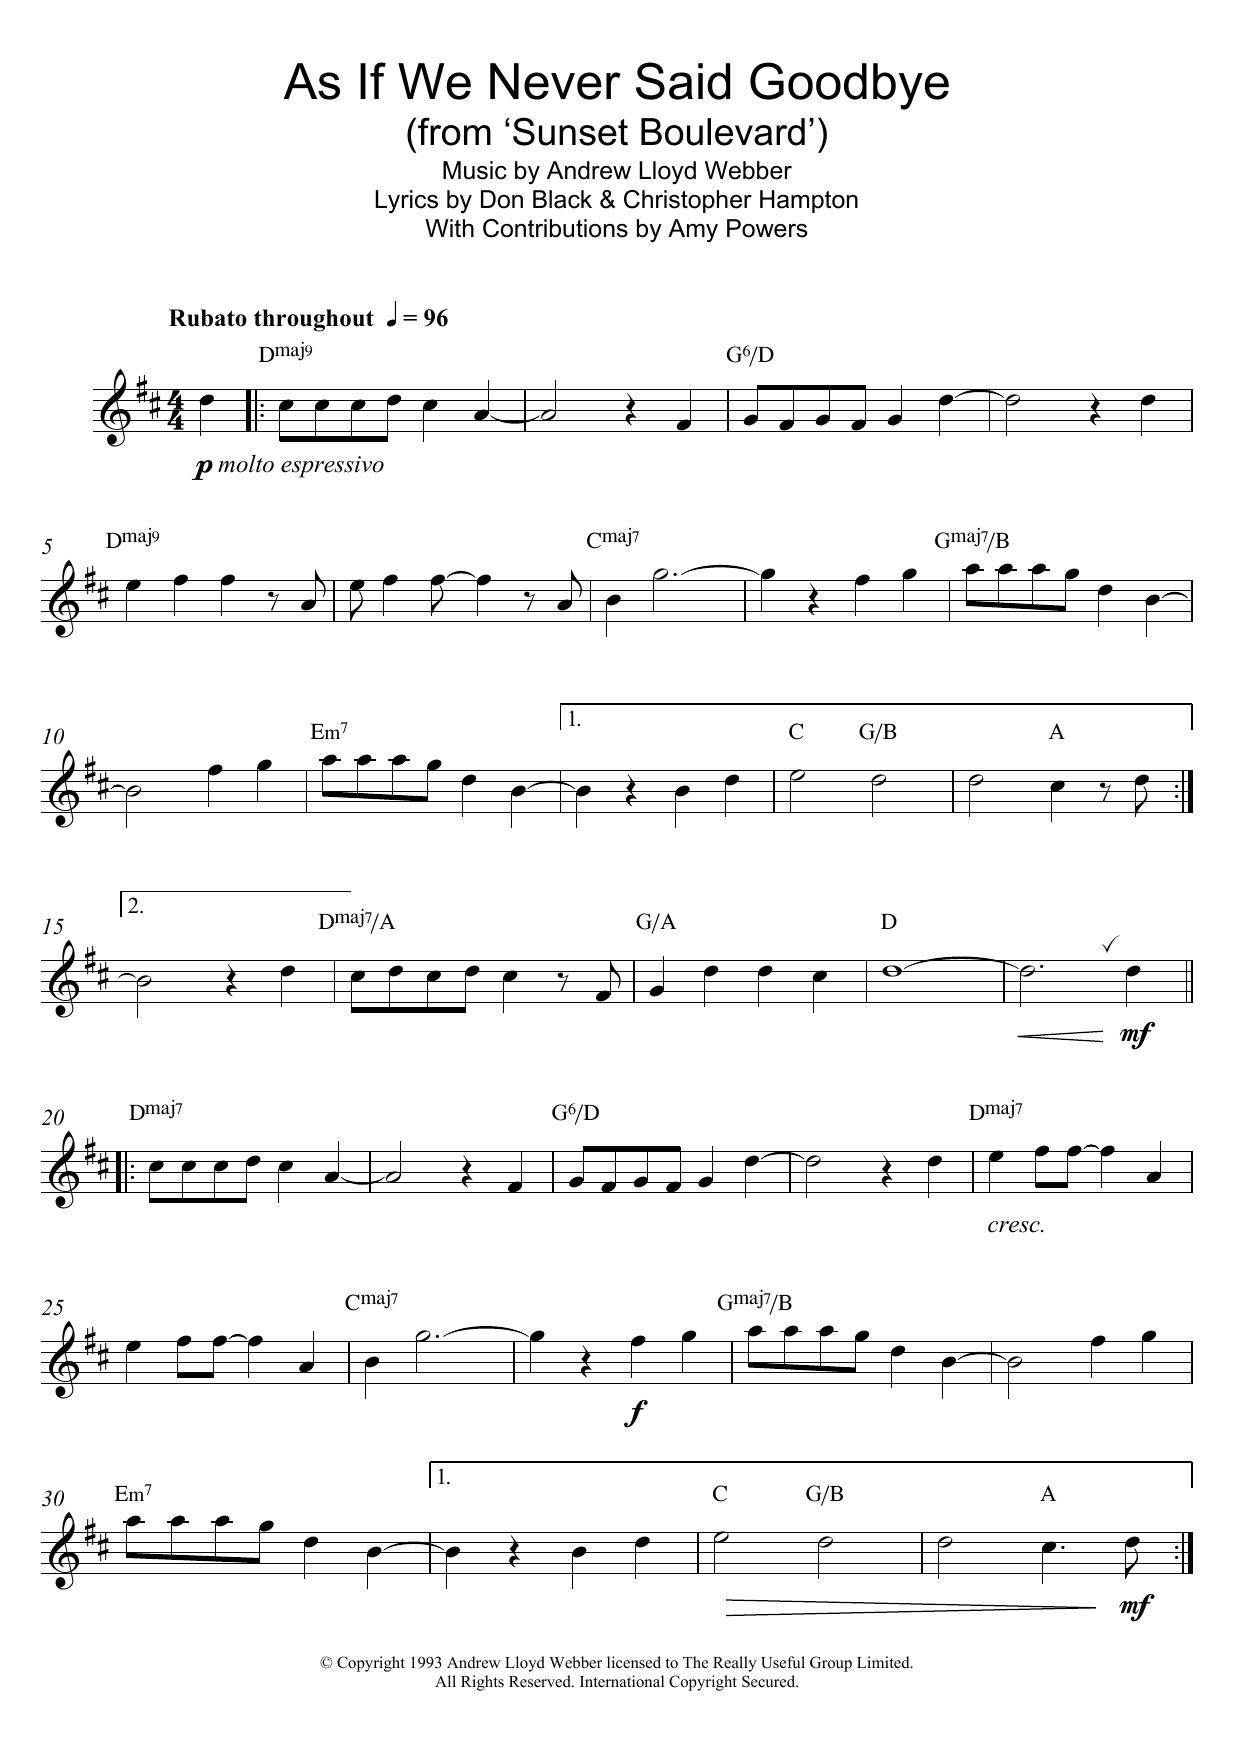 Andrew Lloyd Webber - As If We Never Said Goodbye (from Sunset Boulevard)